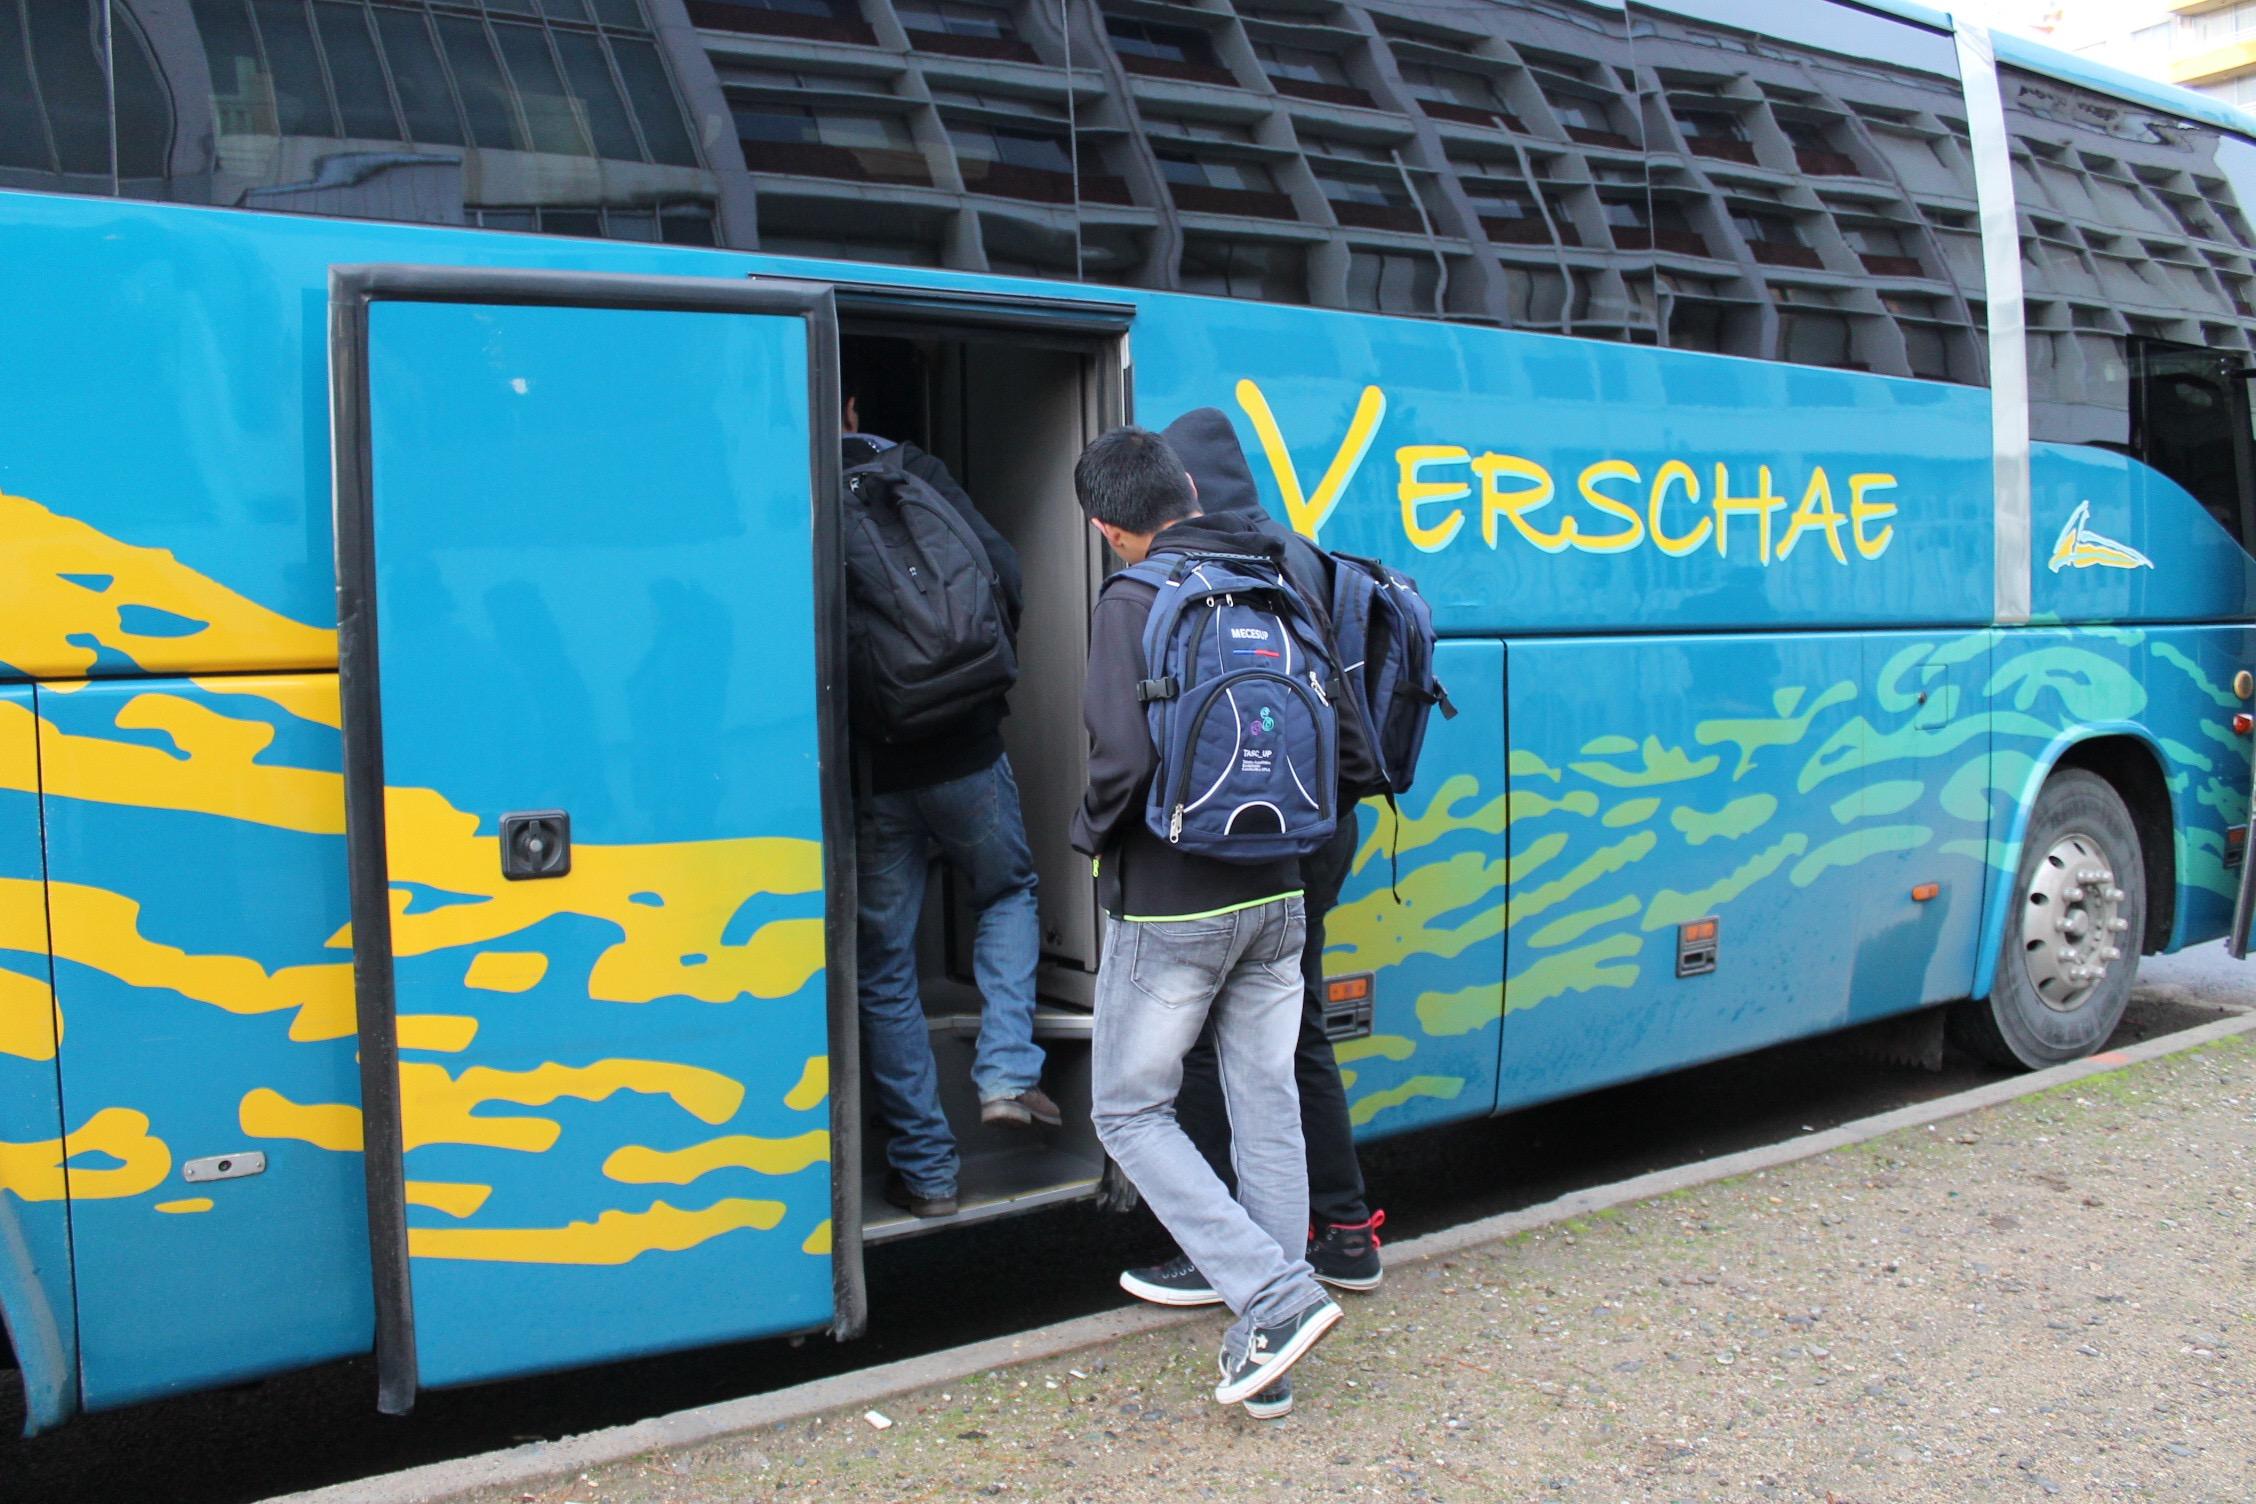 Subida al Bus